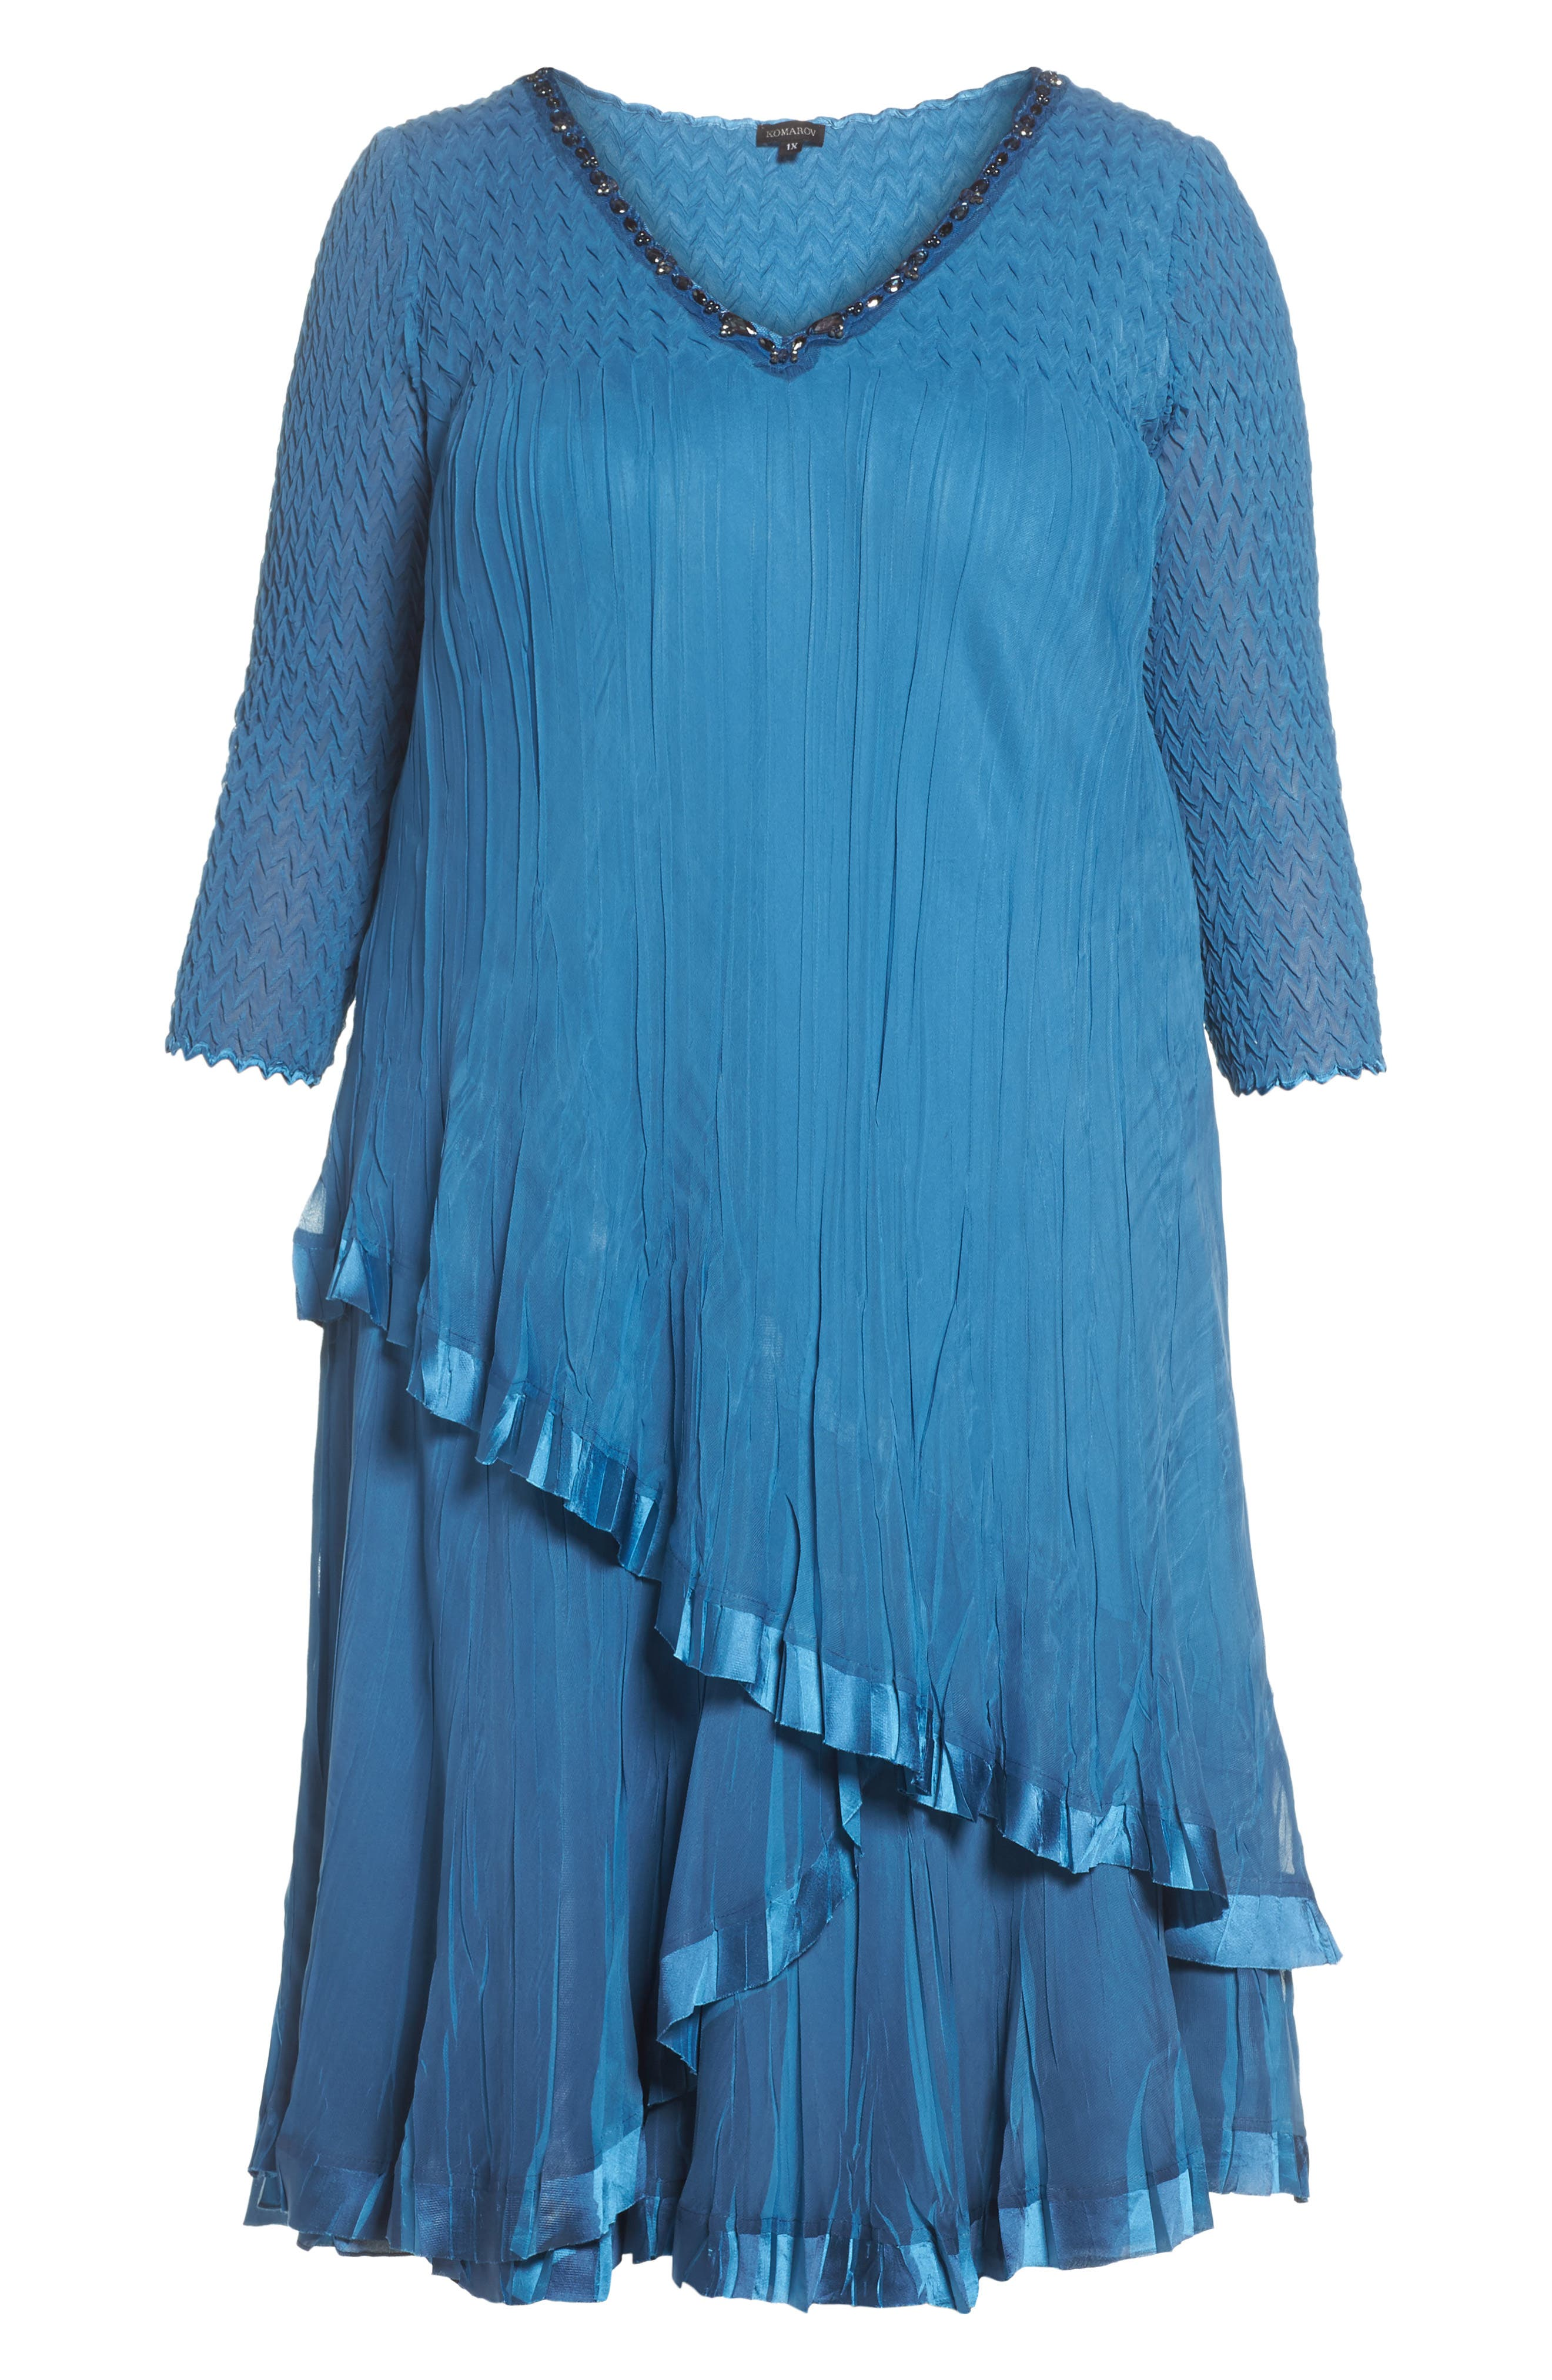 Dress Tiered Chiffon & Charmeuse Dress,                             Alternate thumbnail 6, color,                             400